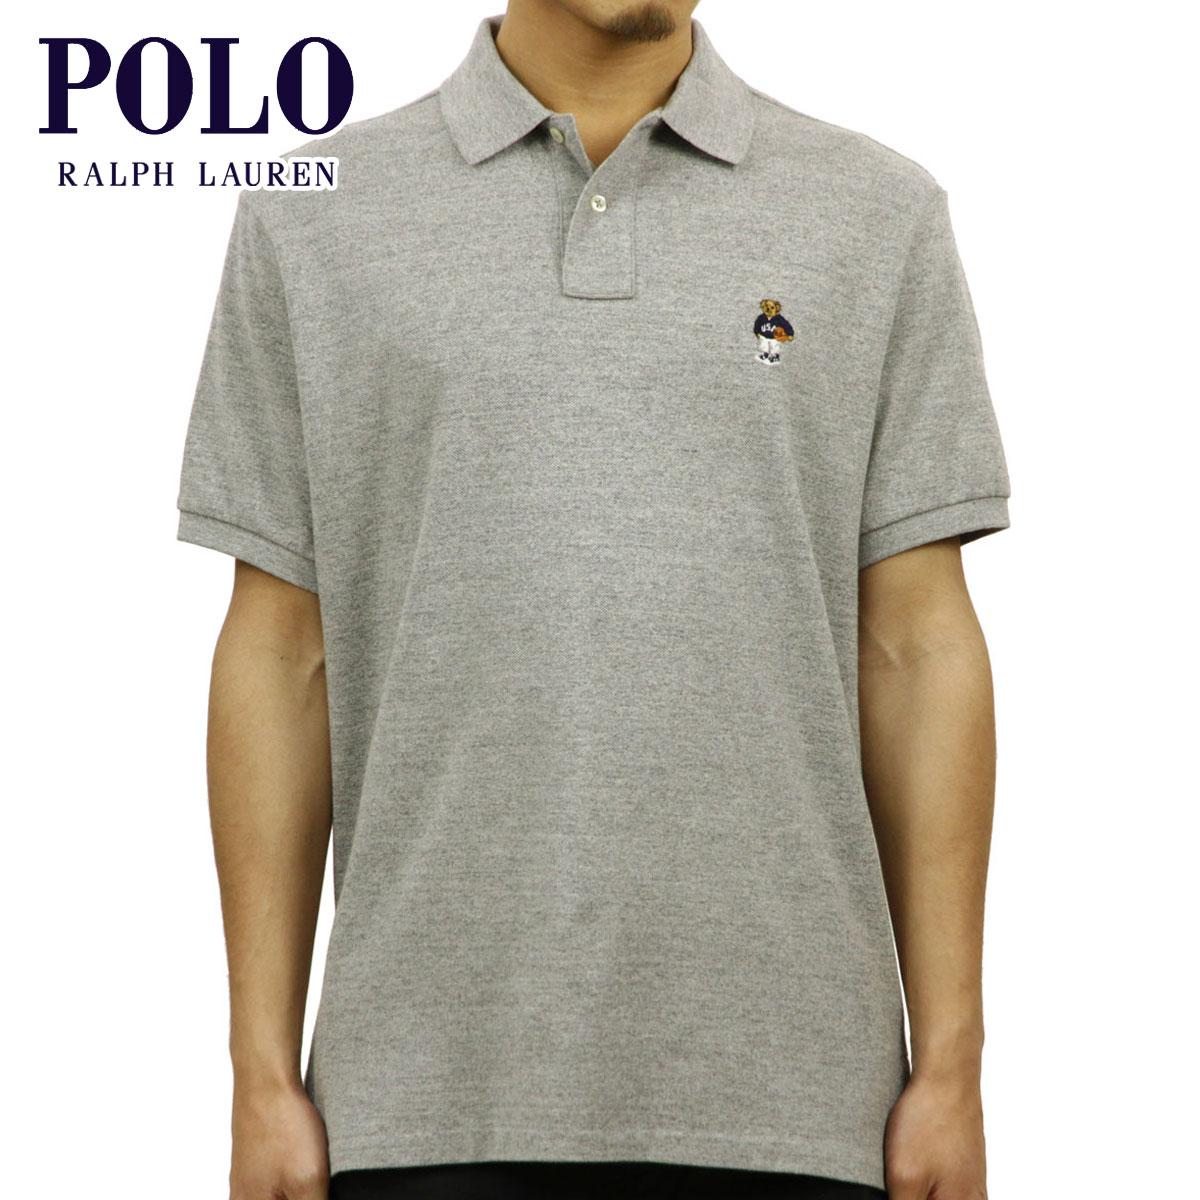 e53a2aa9 Polo Ralph Lauren POLO RALPH LAUREN regular article men custom fitting  short sleeves polo shirt POLO ...